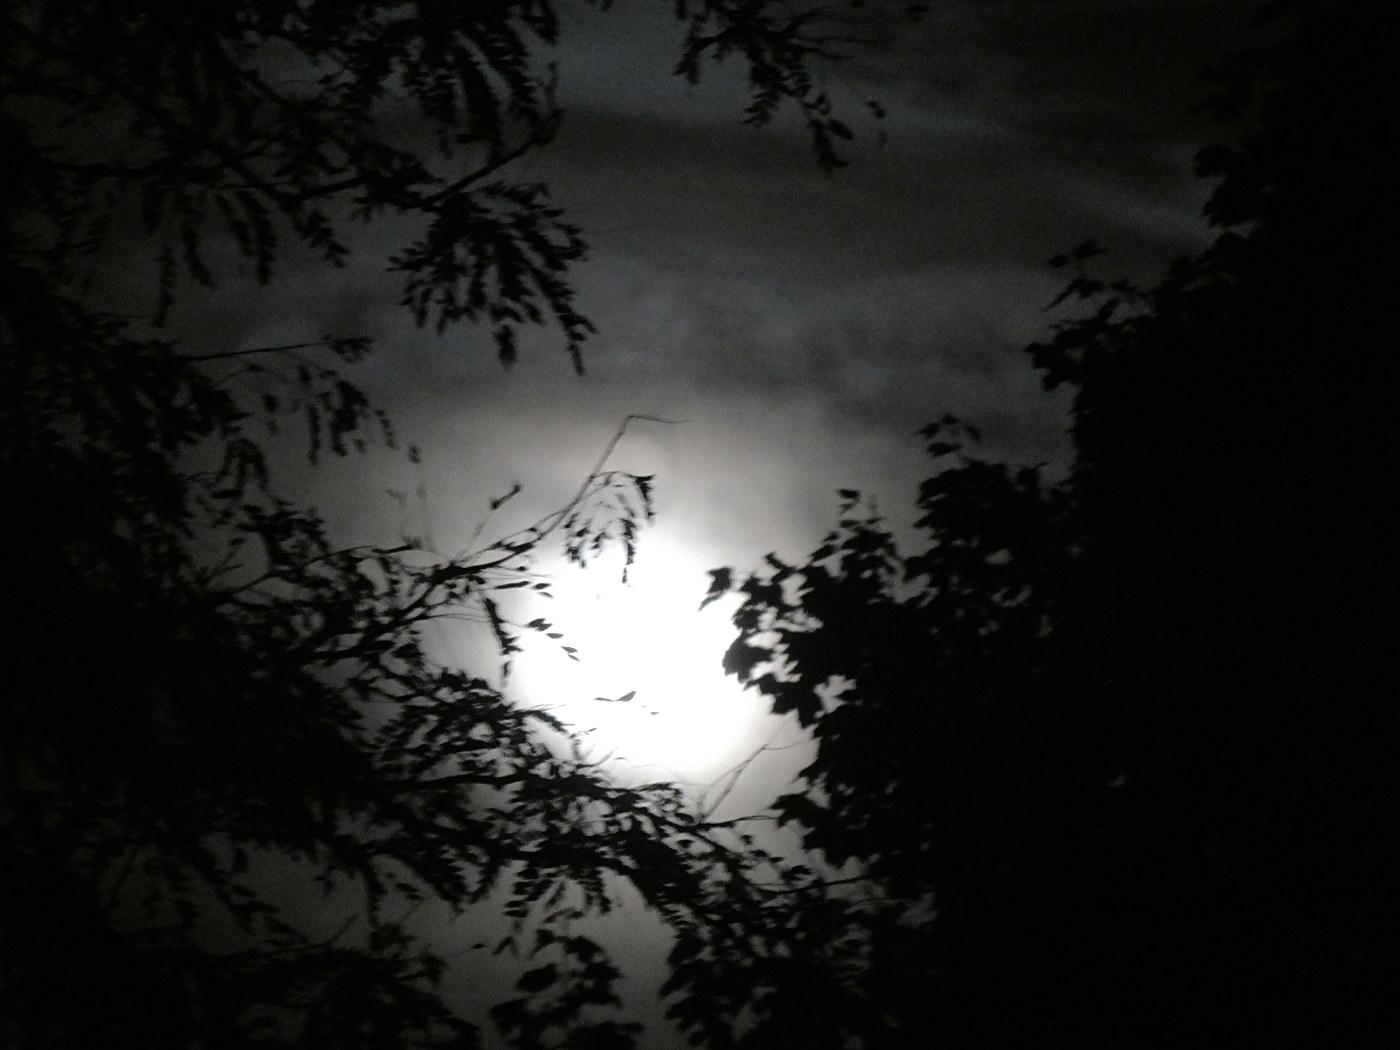 White globe shines through gray hazy clouds and tree limbs